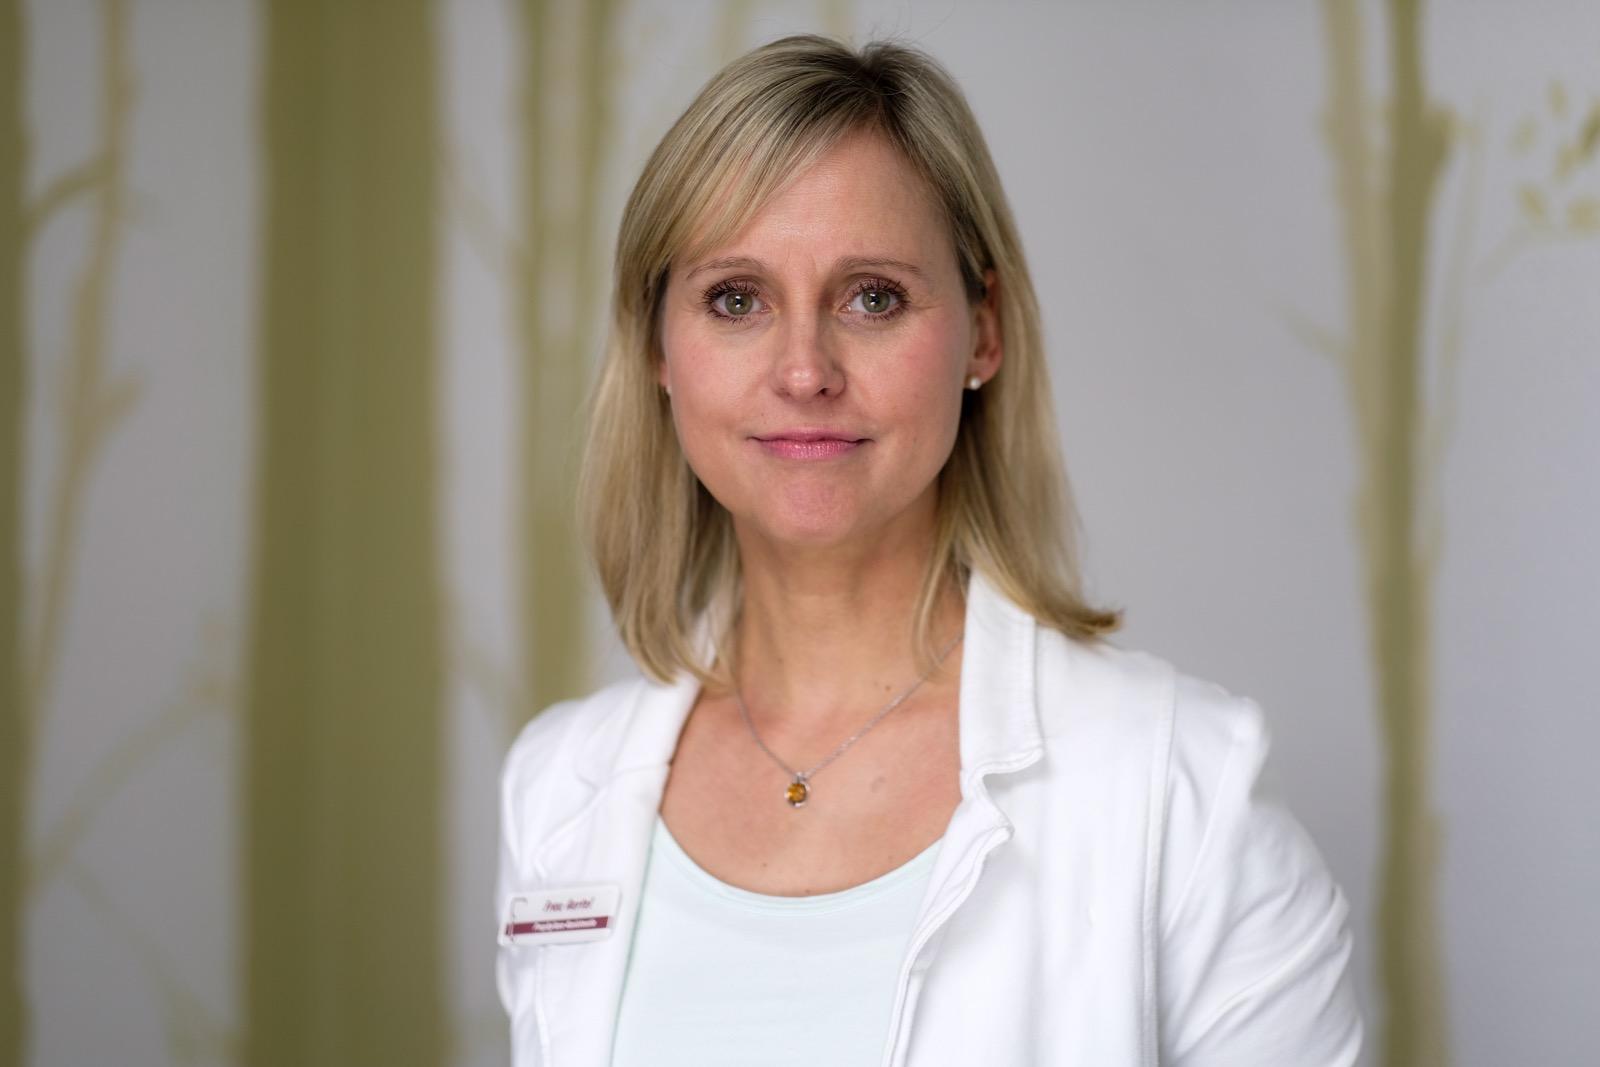 Jacqueline Aertel